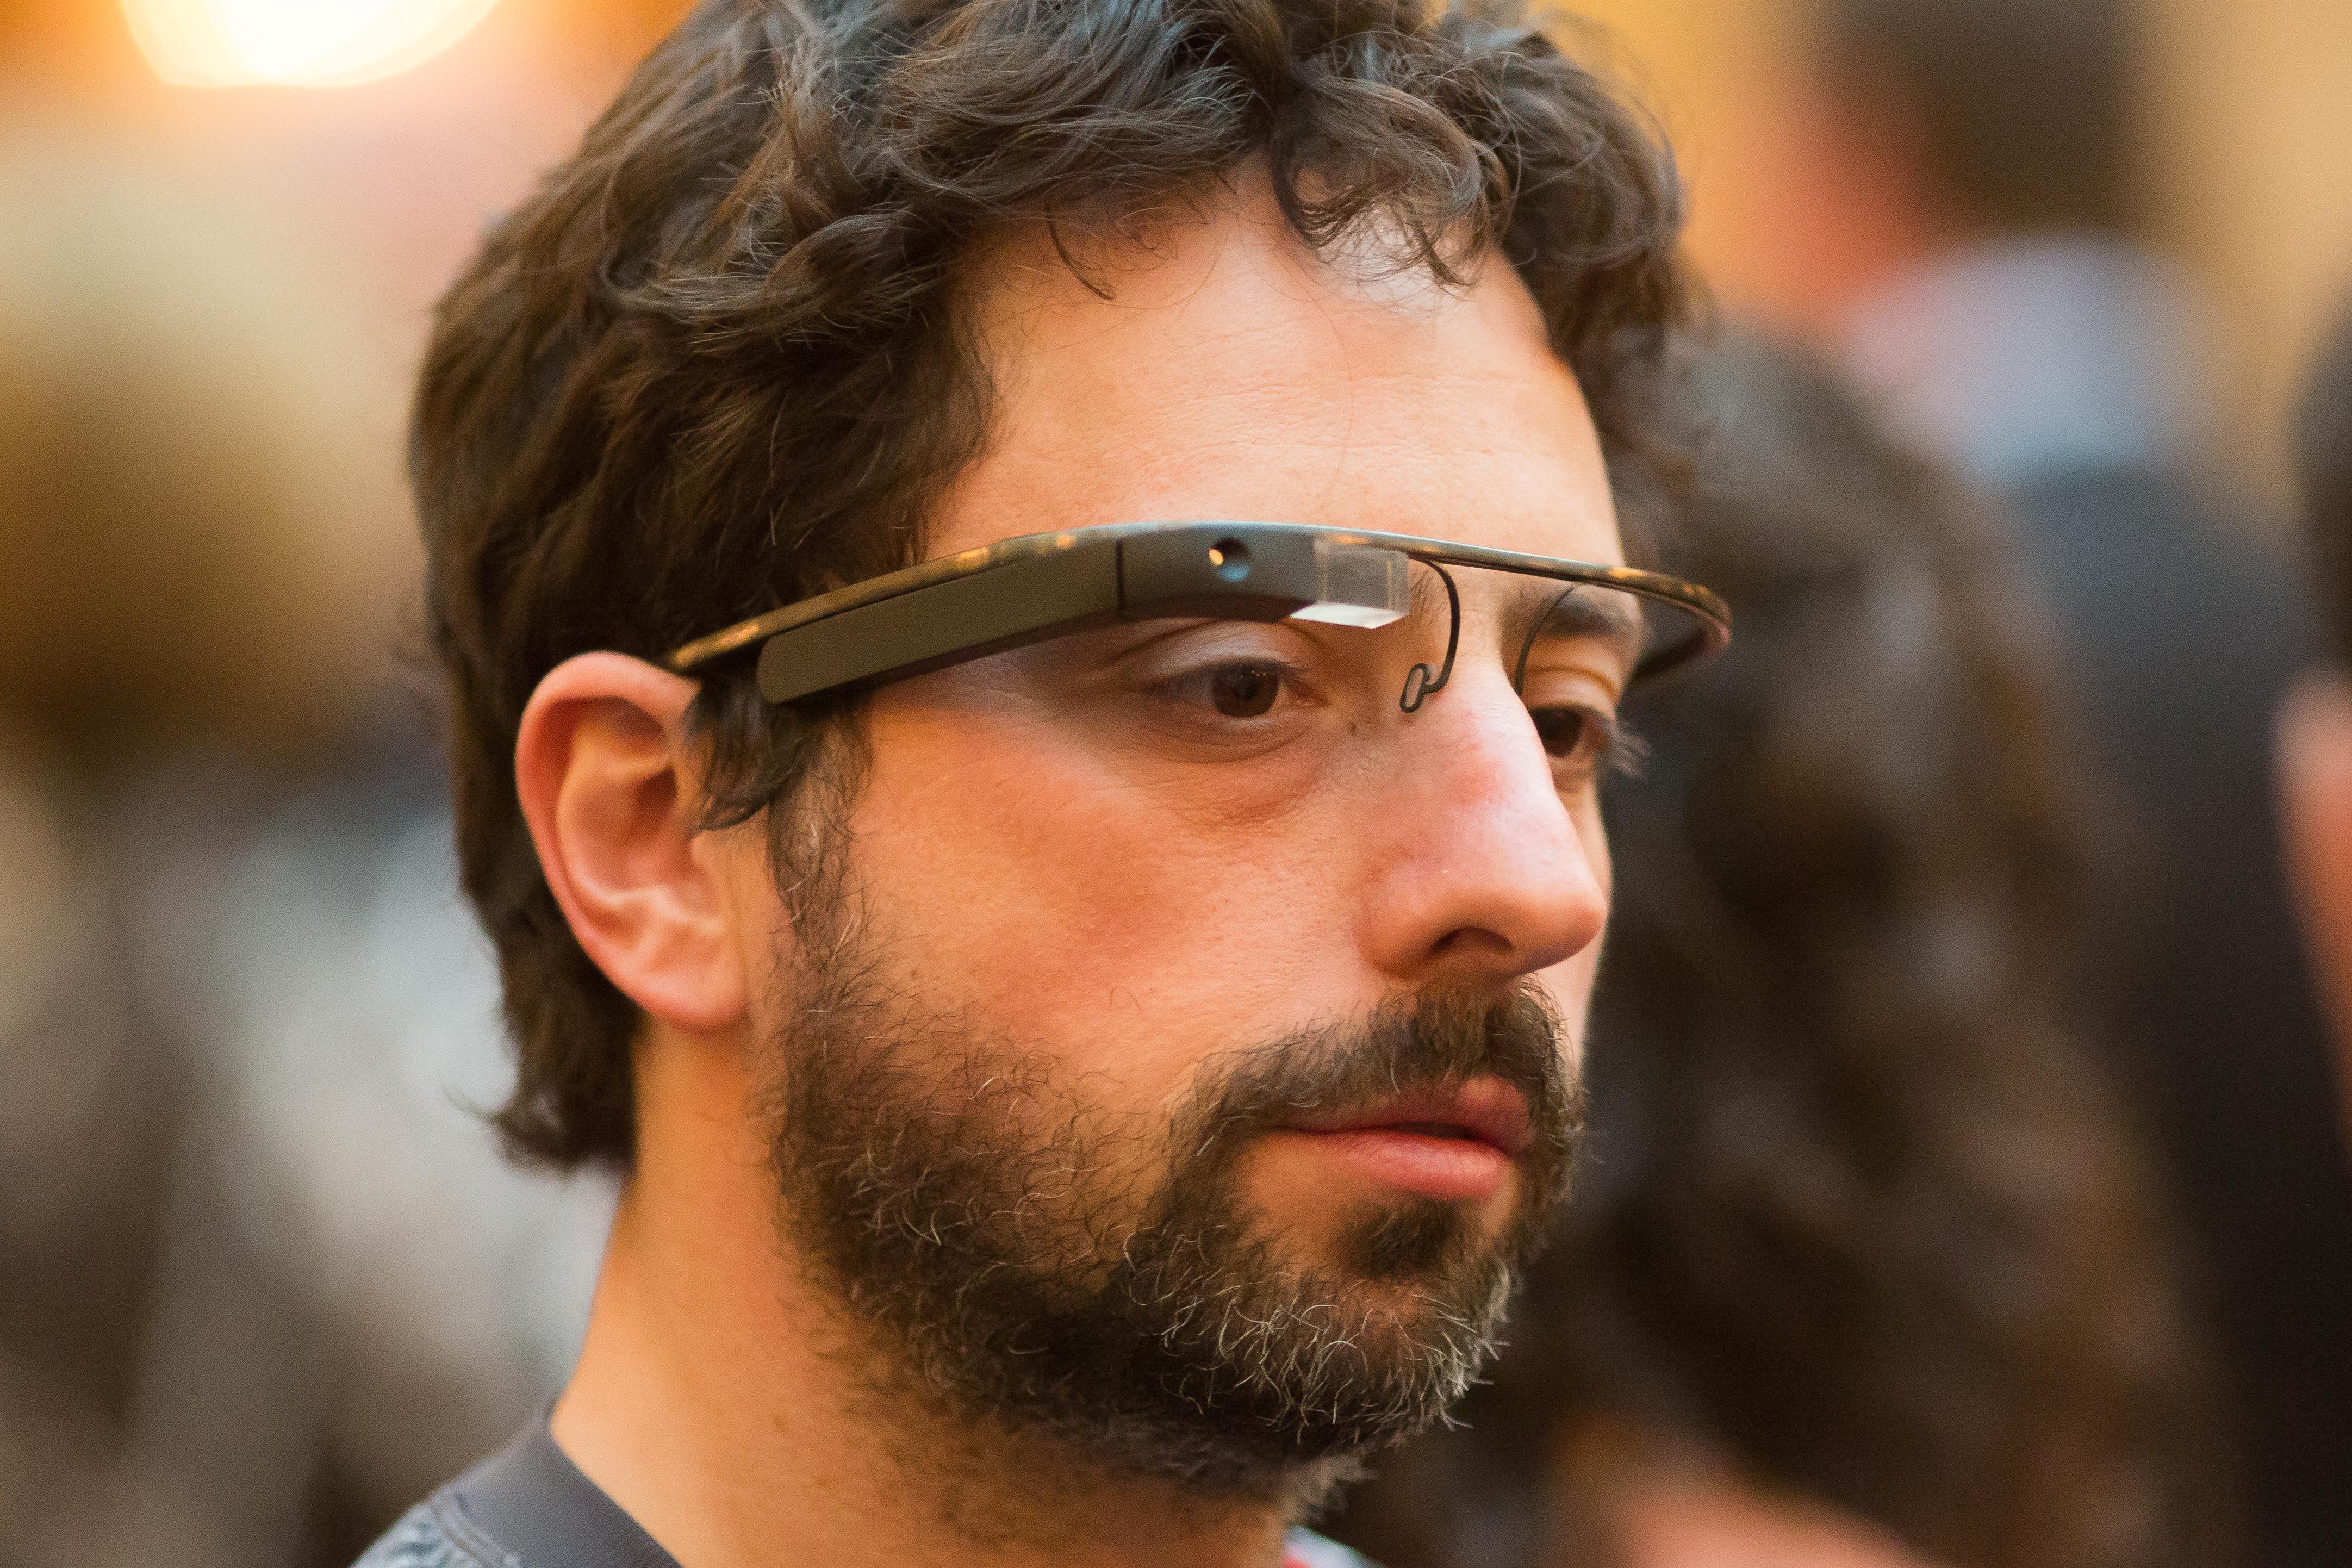 Google Co-Founder Sergey Brin Sports the New Google Glasses